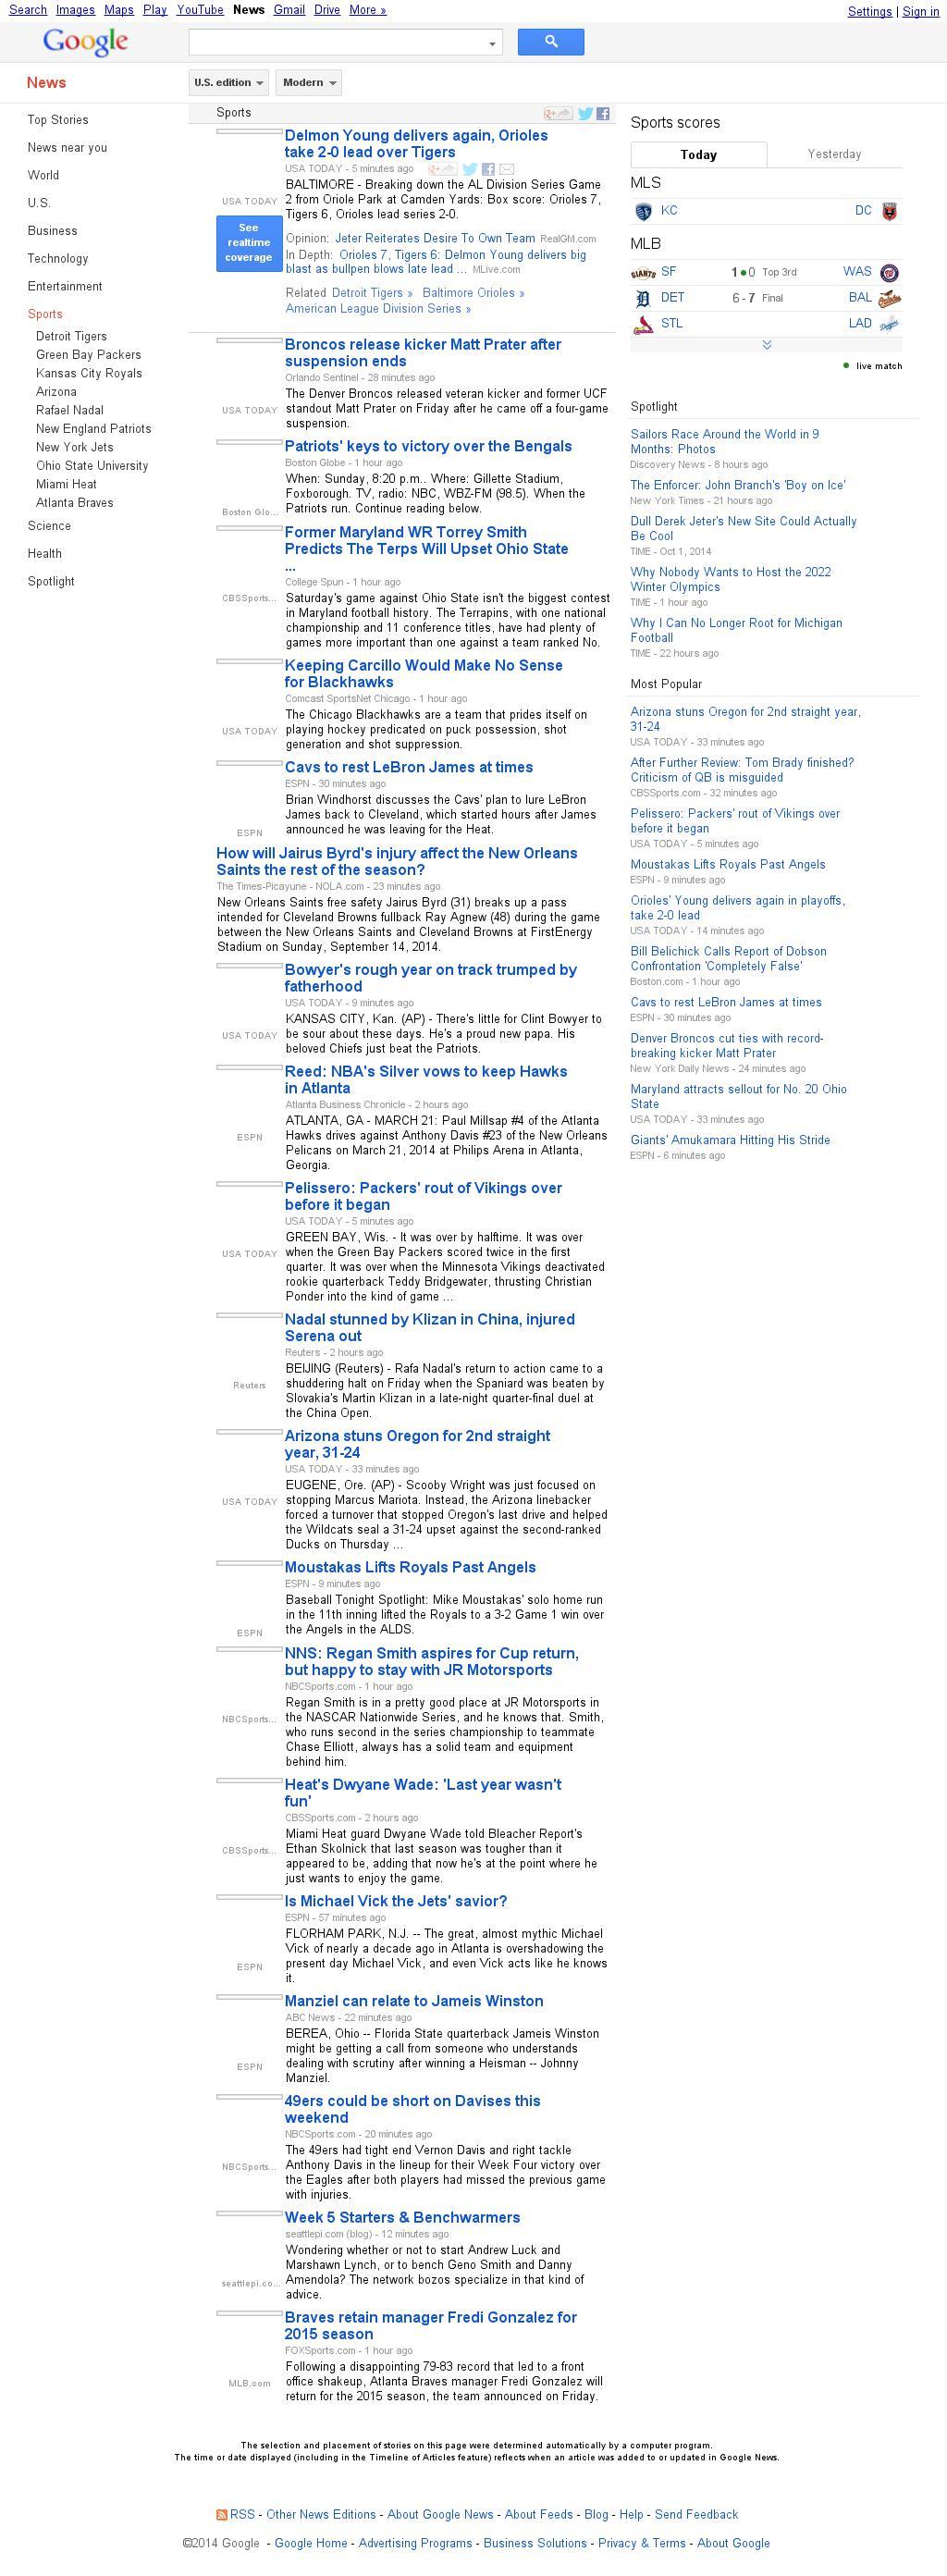 Google News: Sports at Friday Oct. 3, 2014, 8:07 p.m. UTC